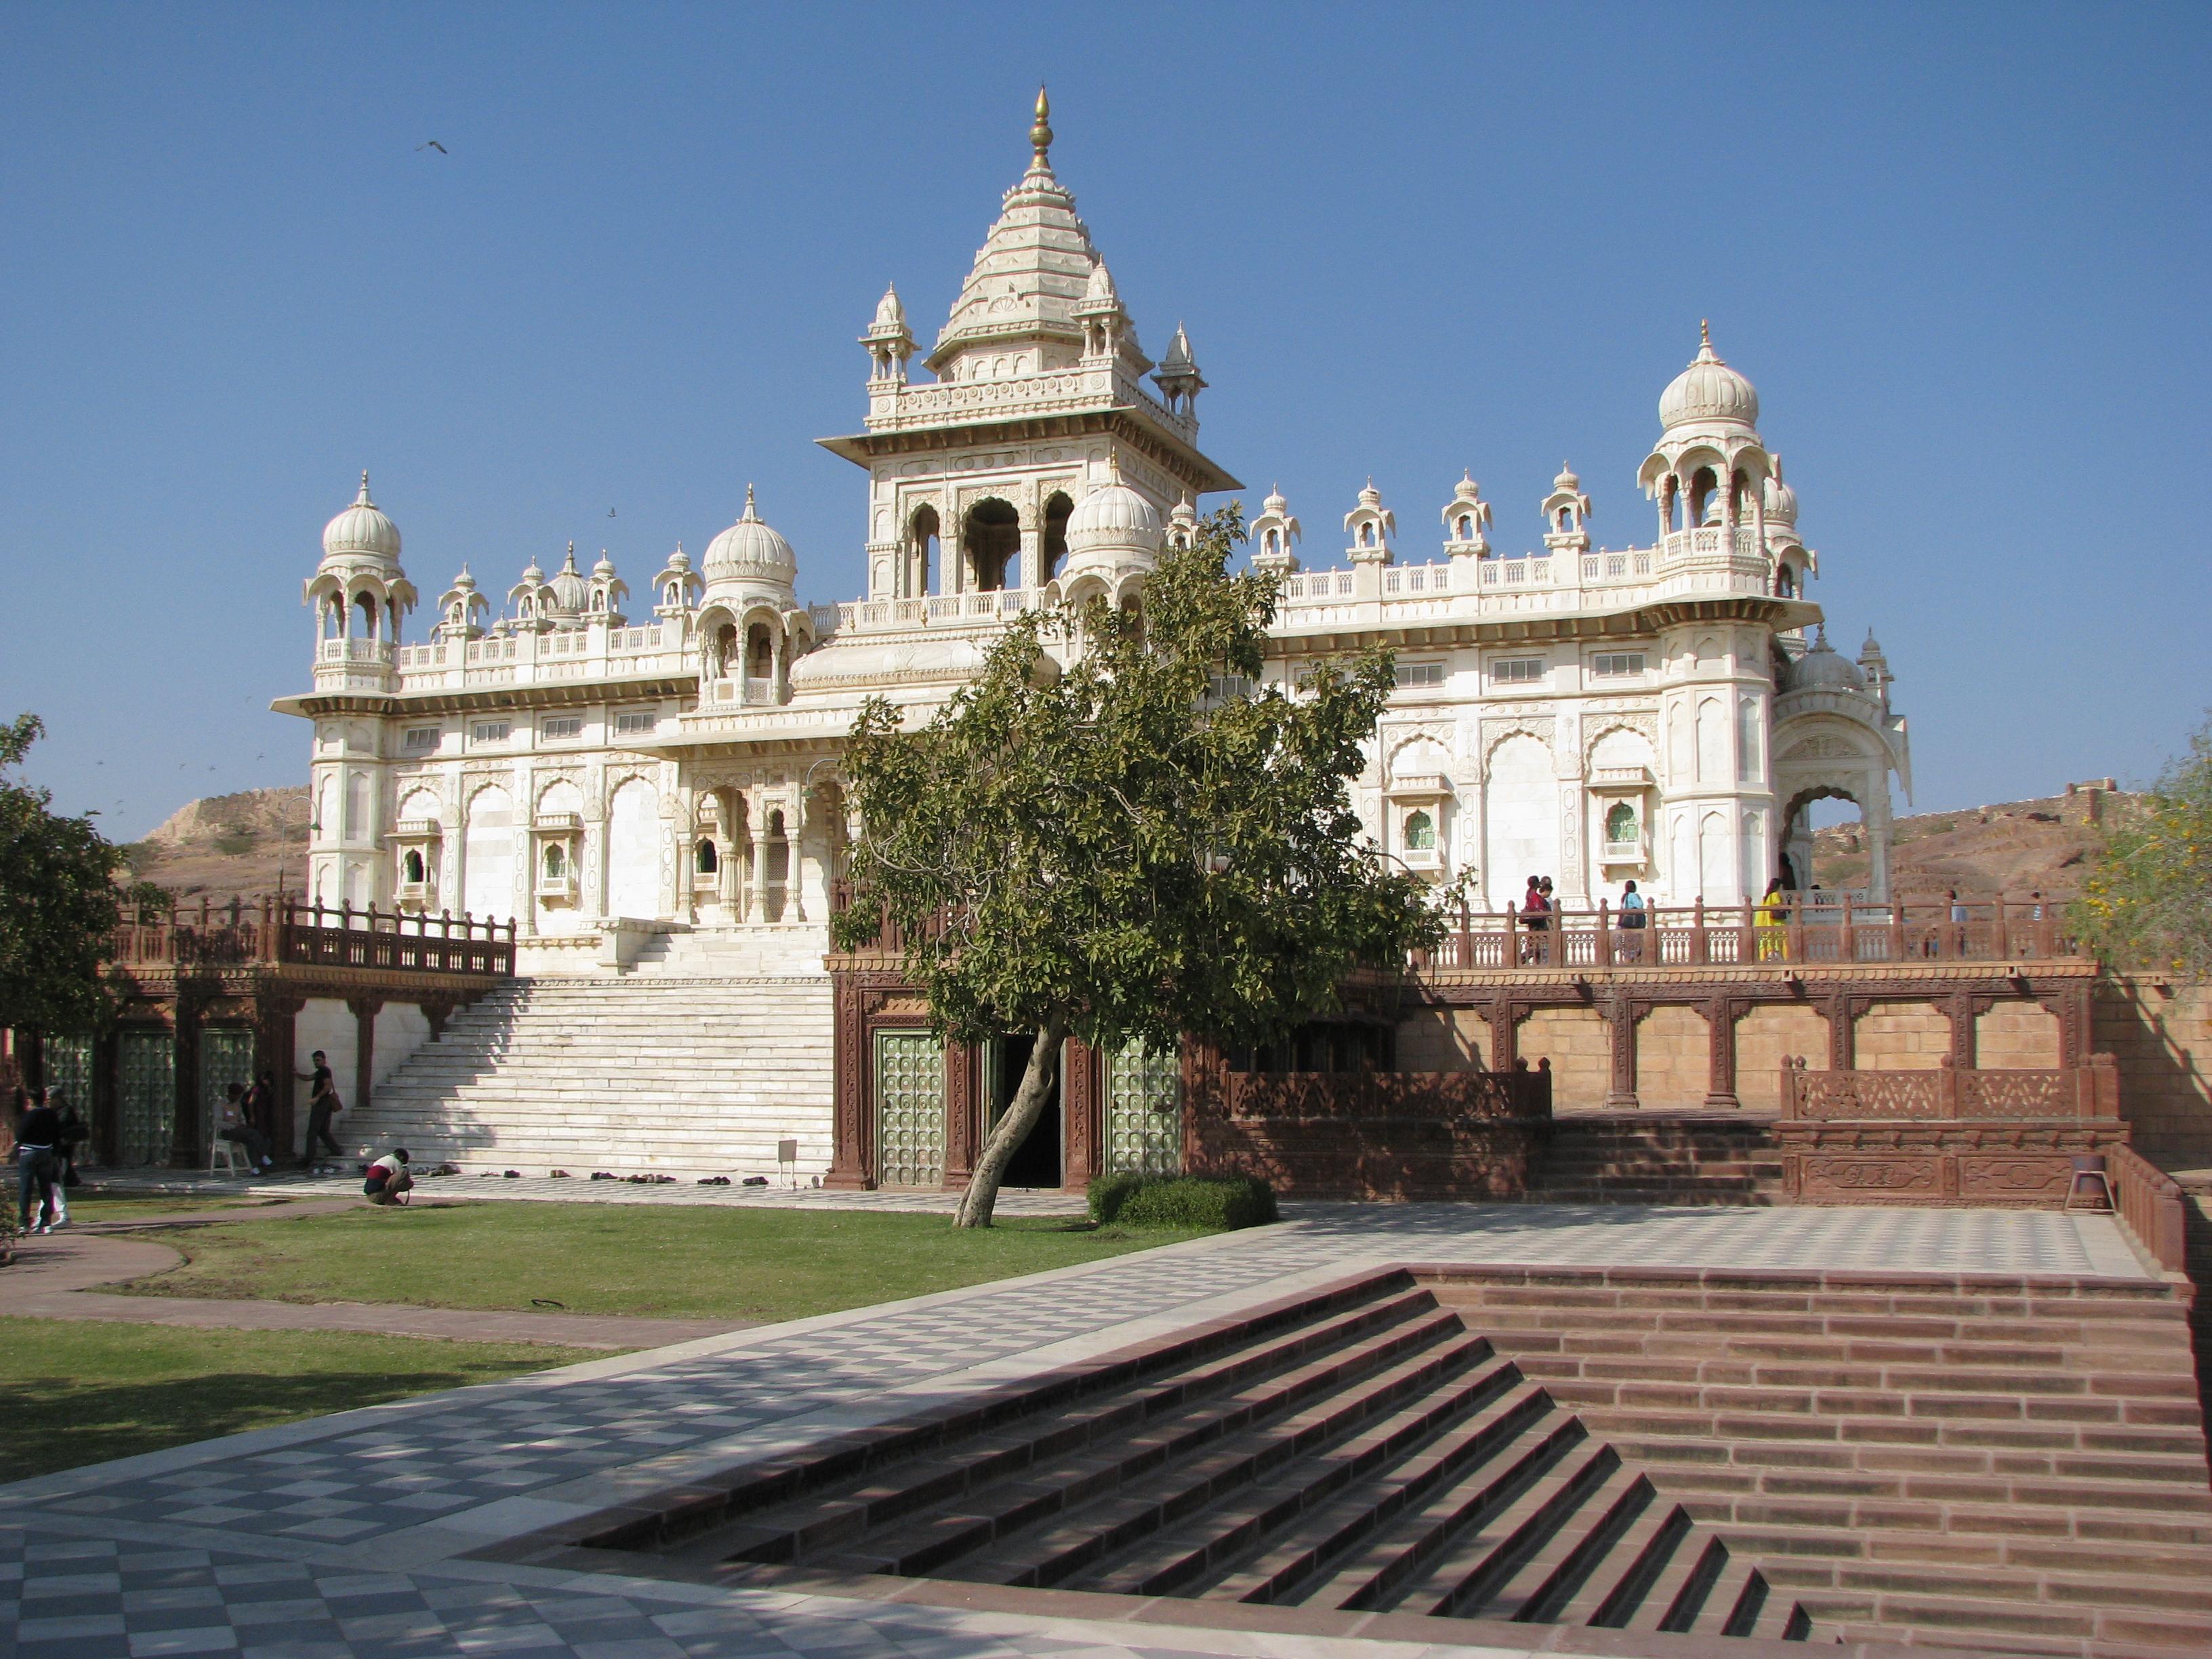 Jaswant Thada, Rajasthan tours